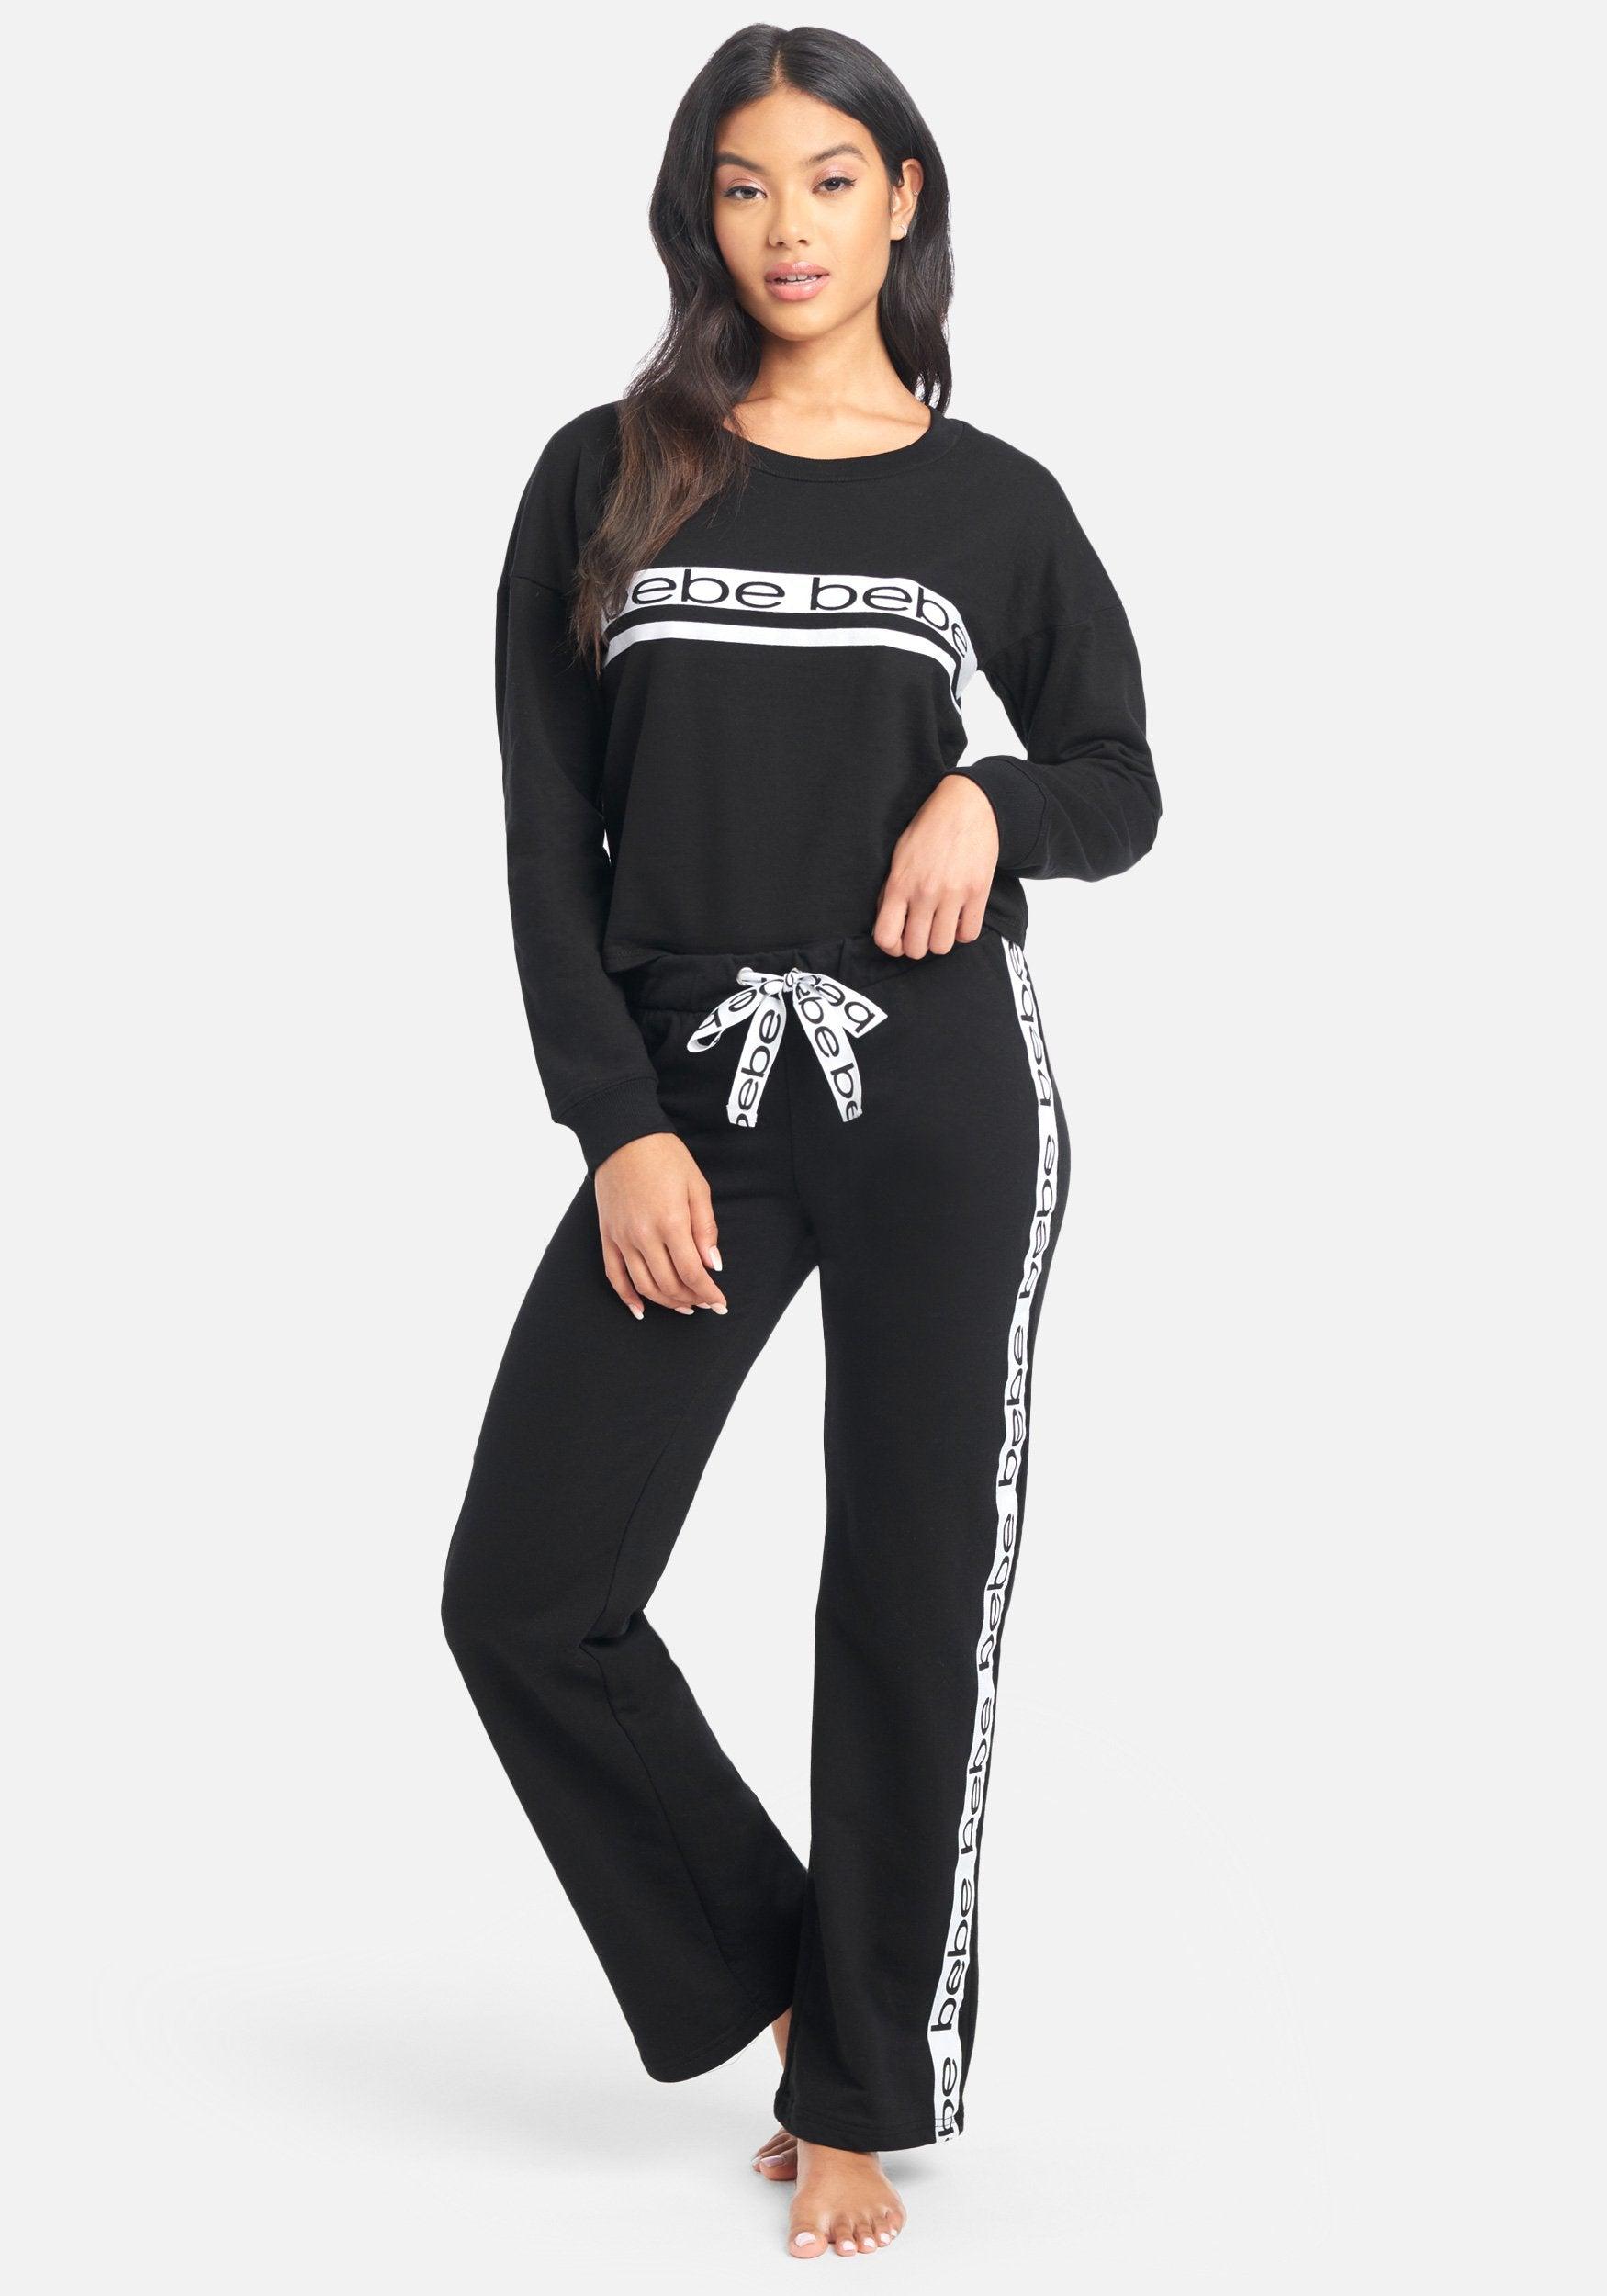 Bebe Women's Sport Stripe Pant Set, Size Large in Black Cotton